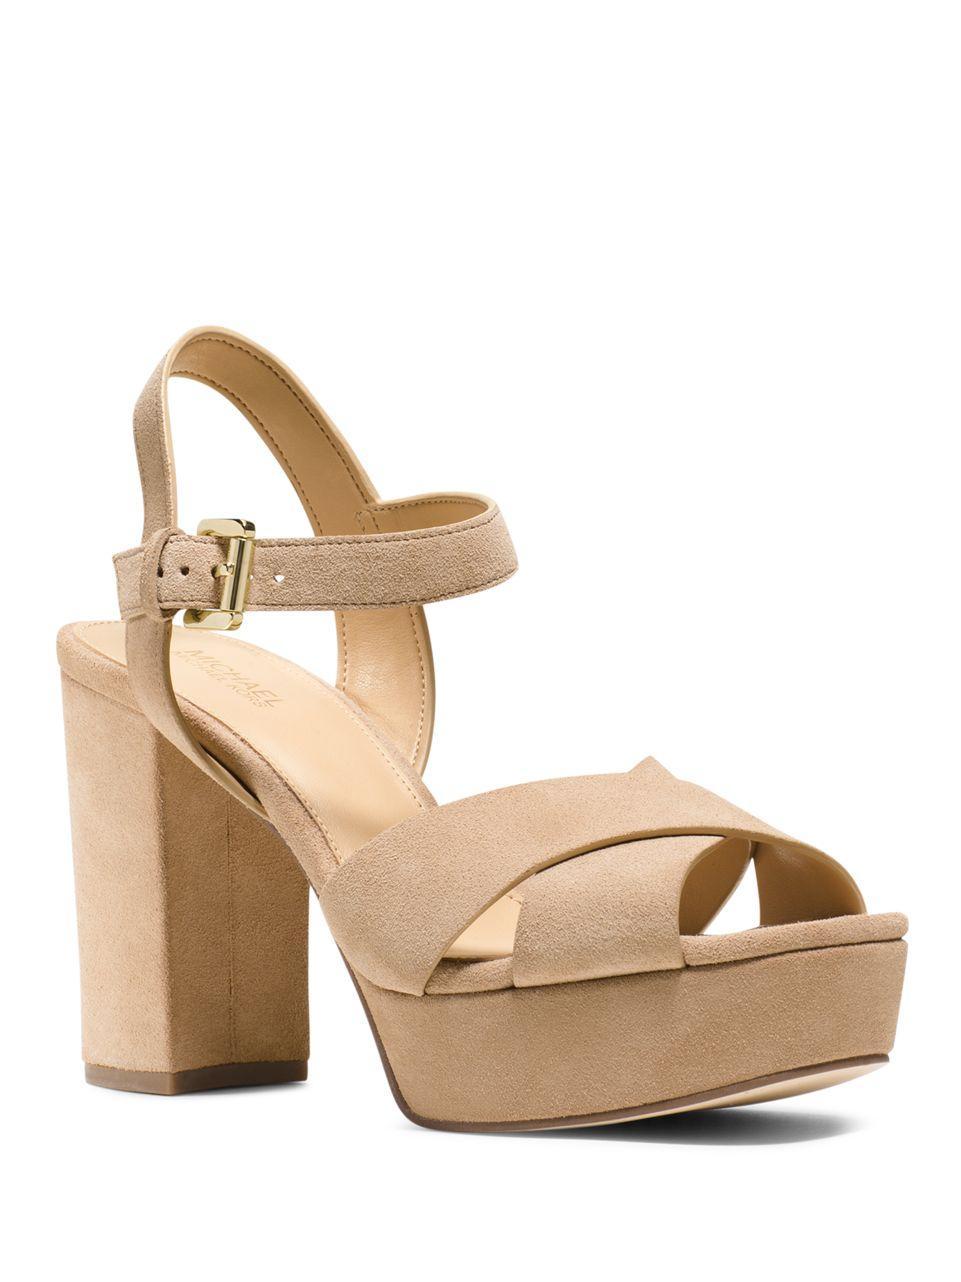 a51a58295833 Lyst - Michael Michael Kors Divia Suede Platform Sandals .